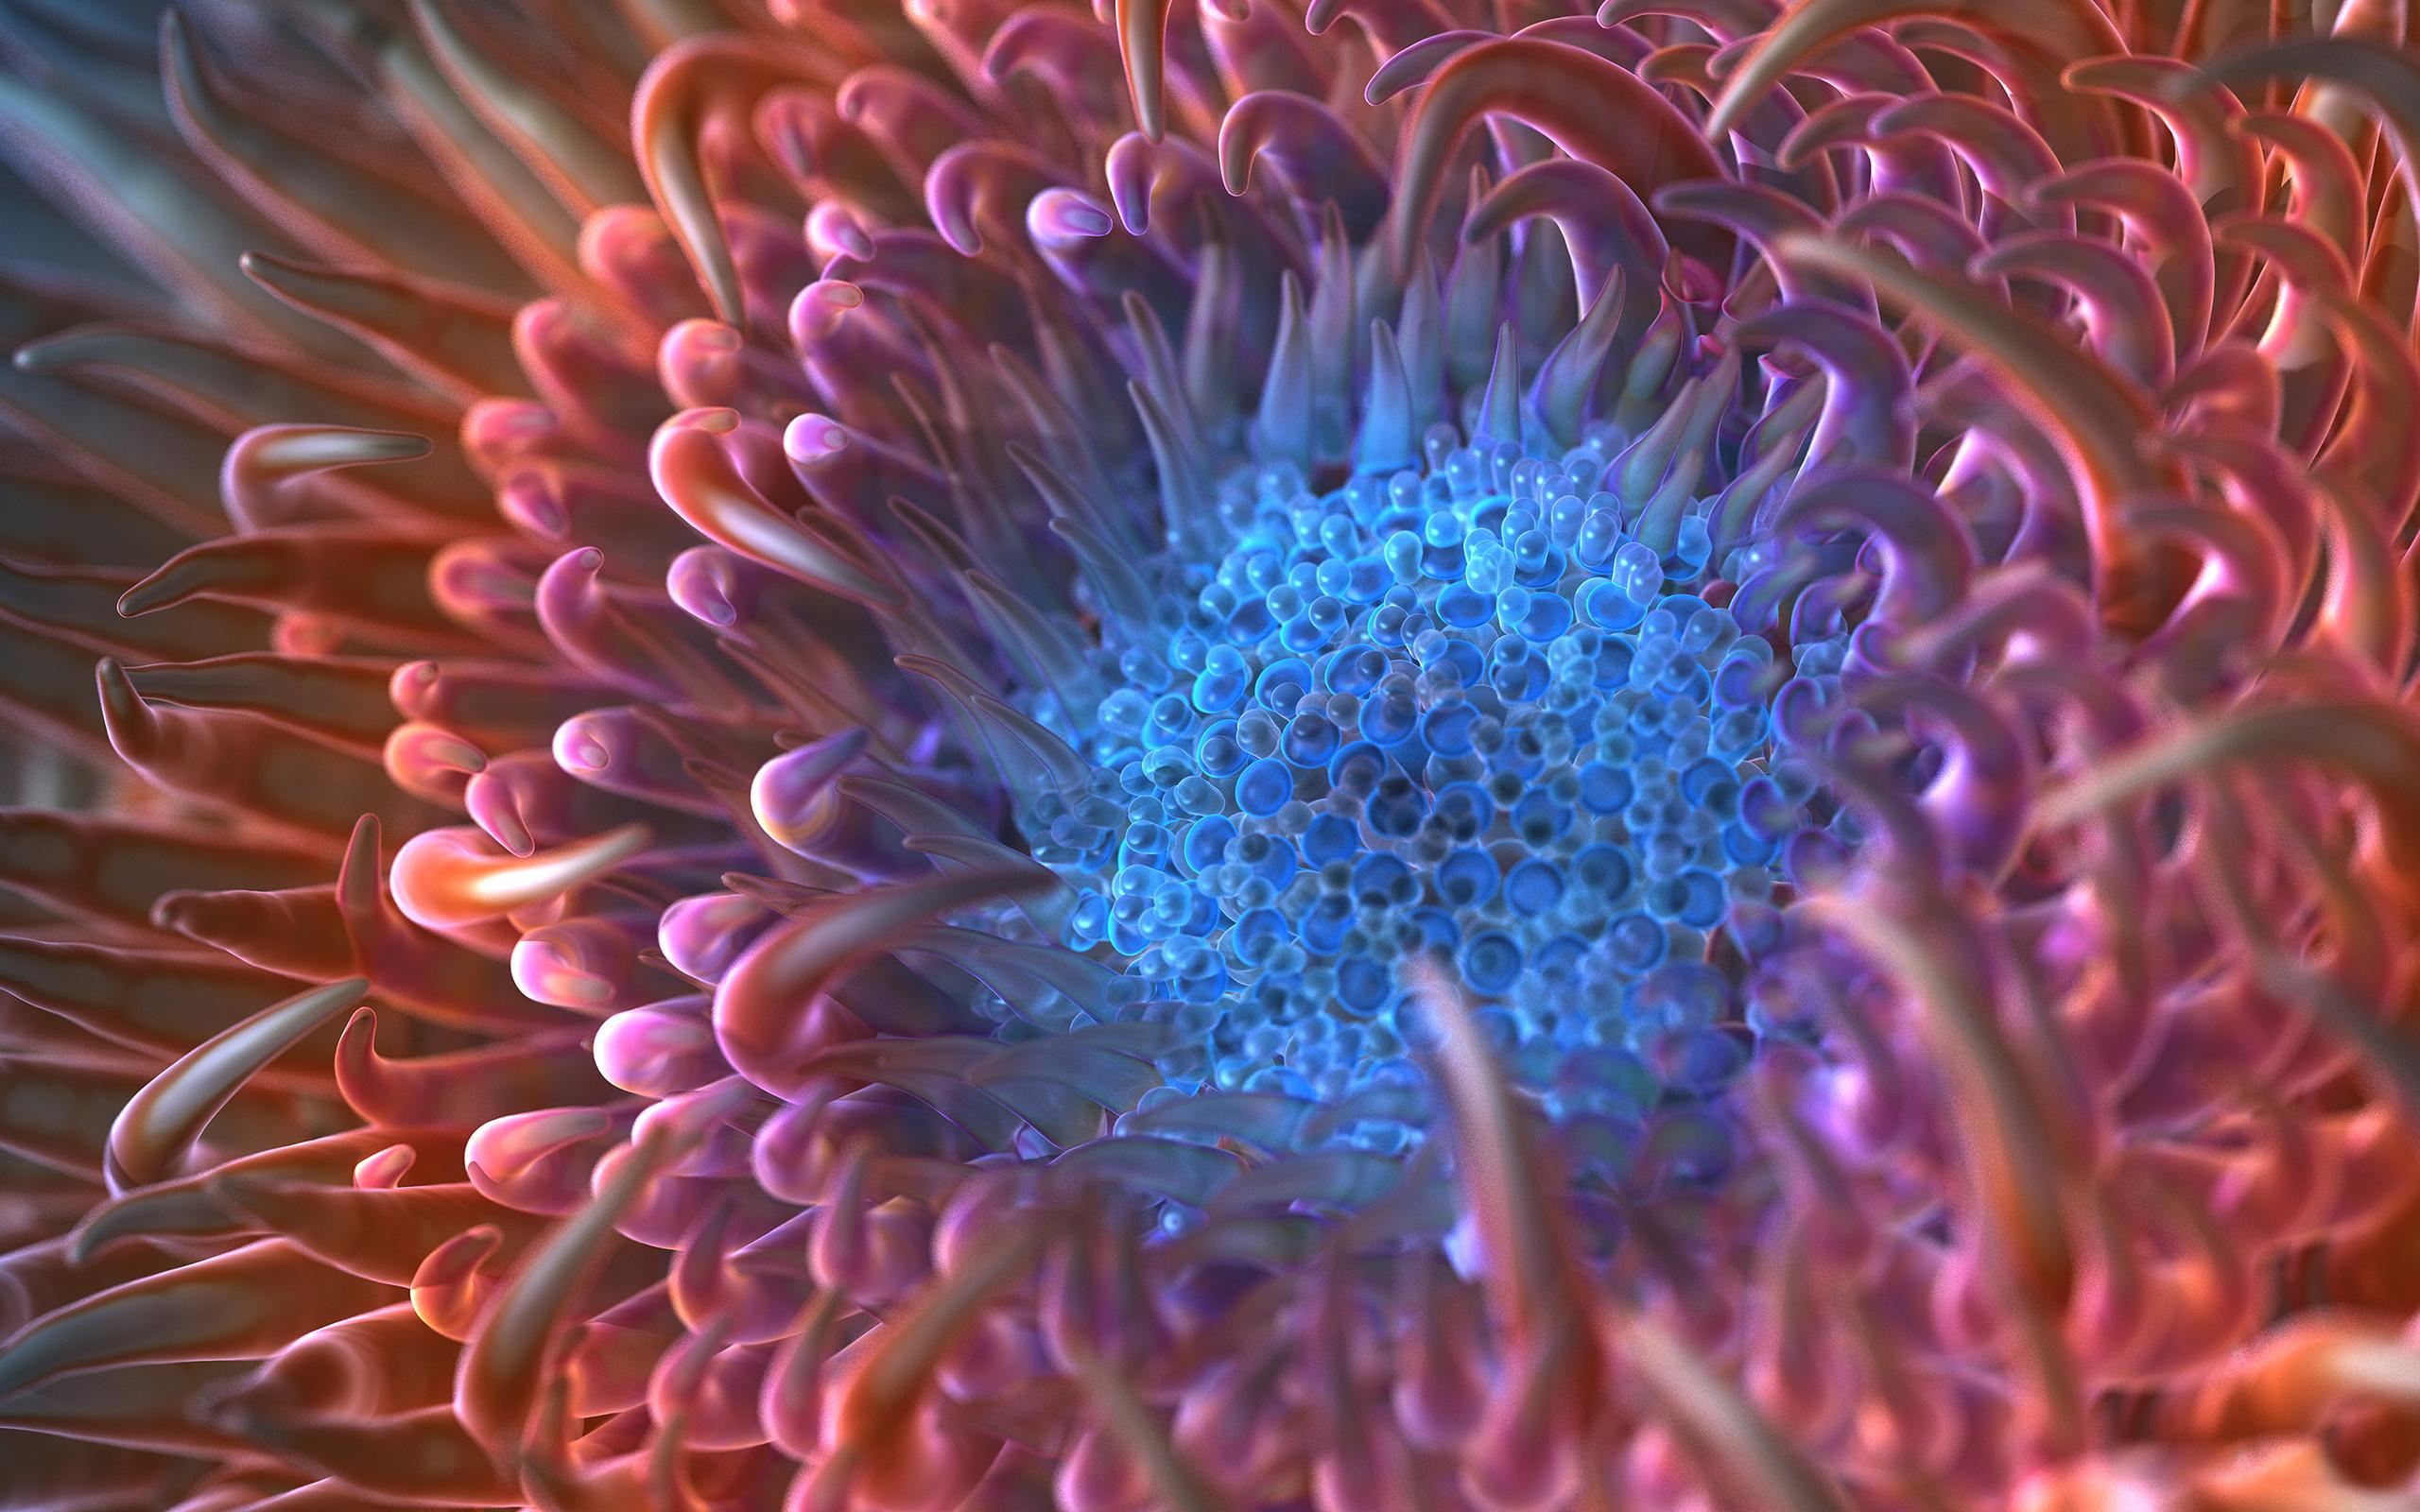 HD Wallpapers Digital Anemone Flower